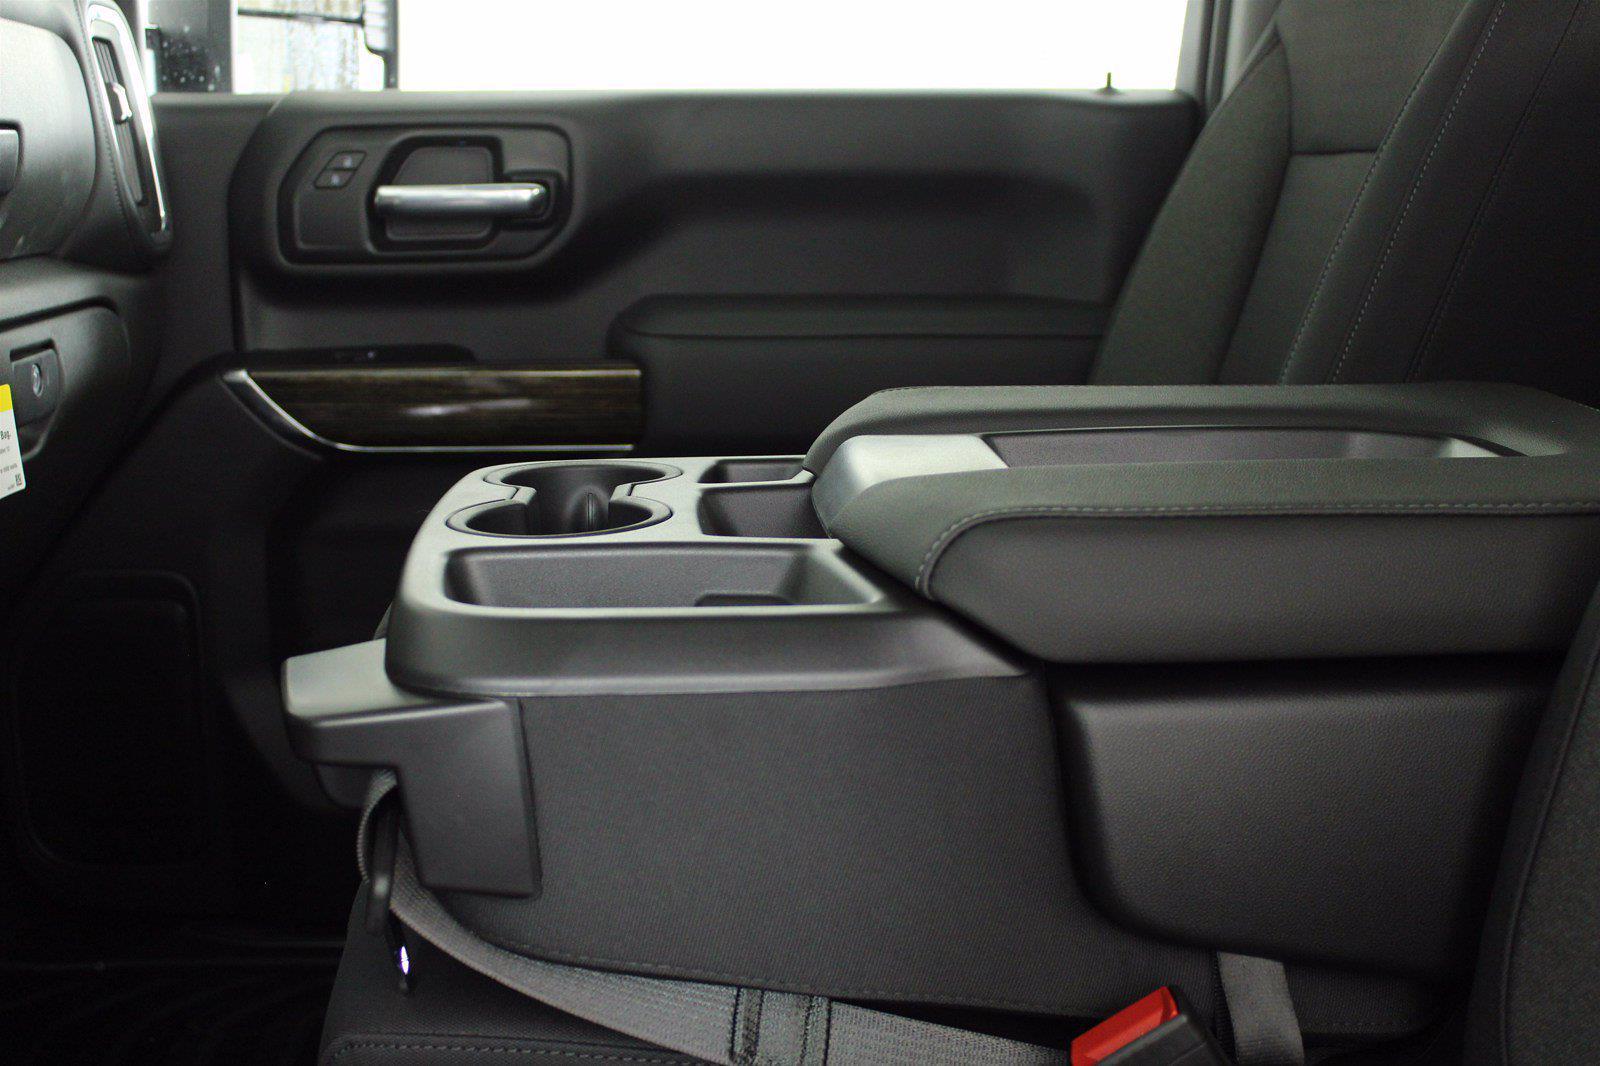 2021 GMC Sierra 2500 Regular Cab 4x4, Pickup #D411067 - photo 12